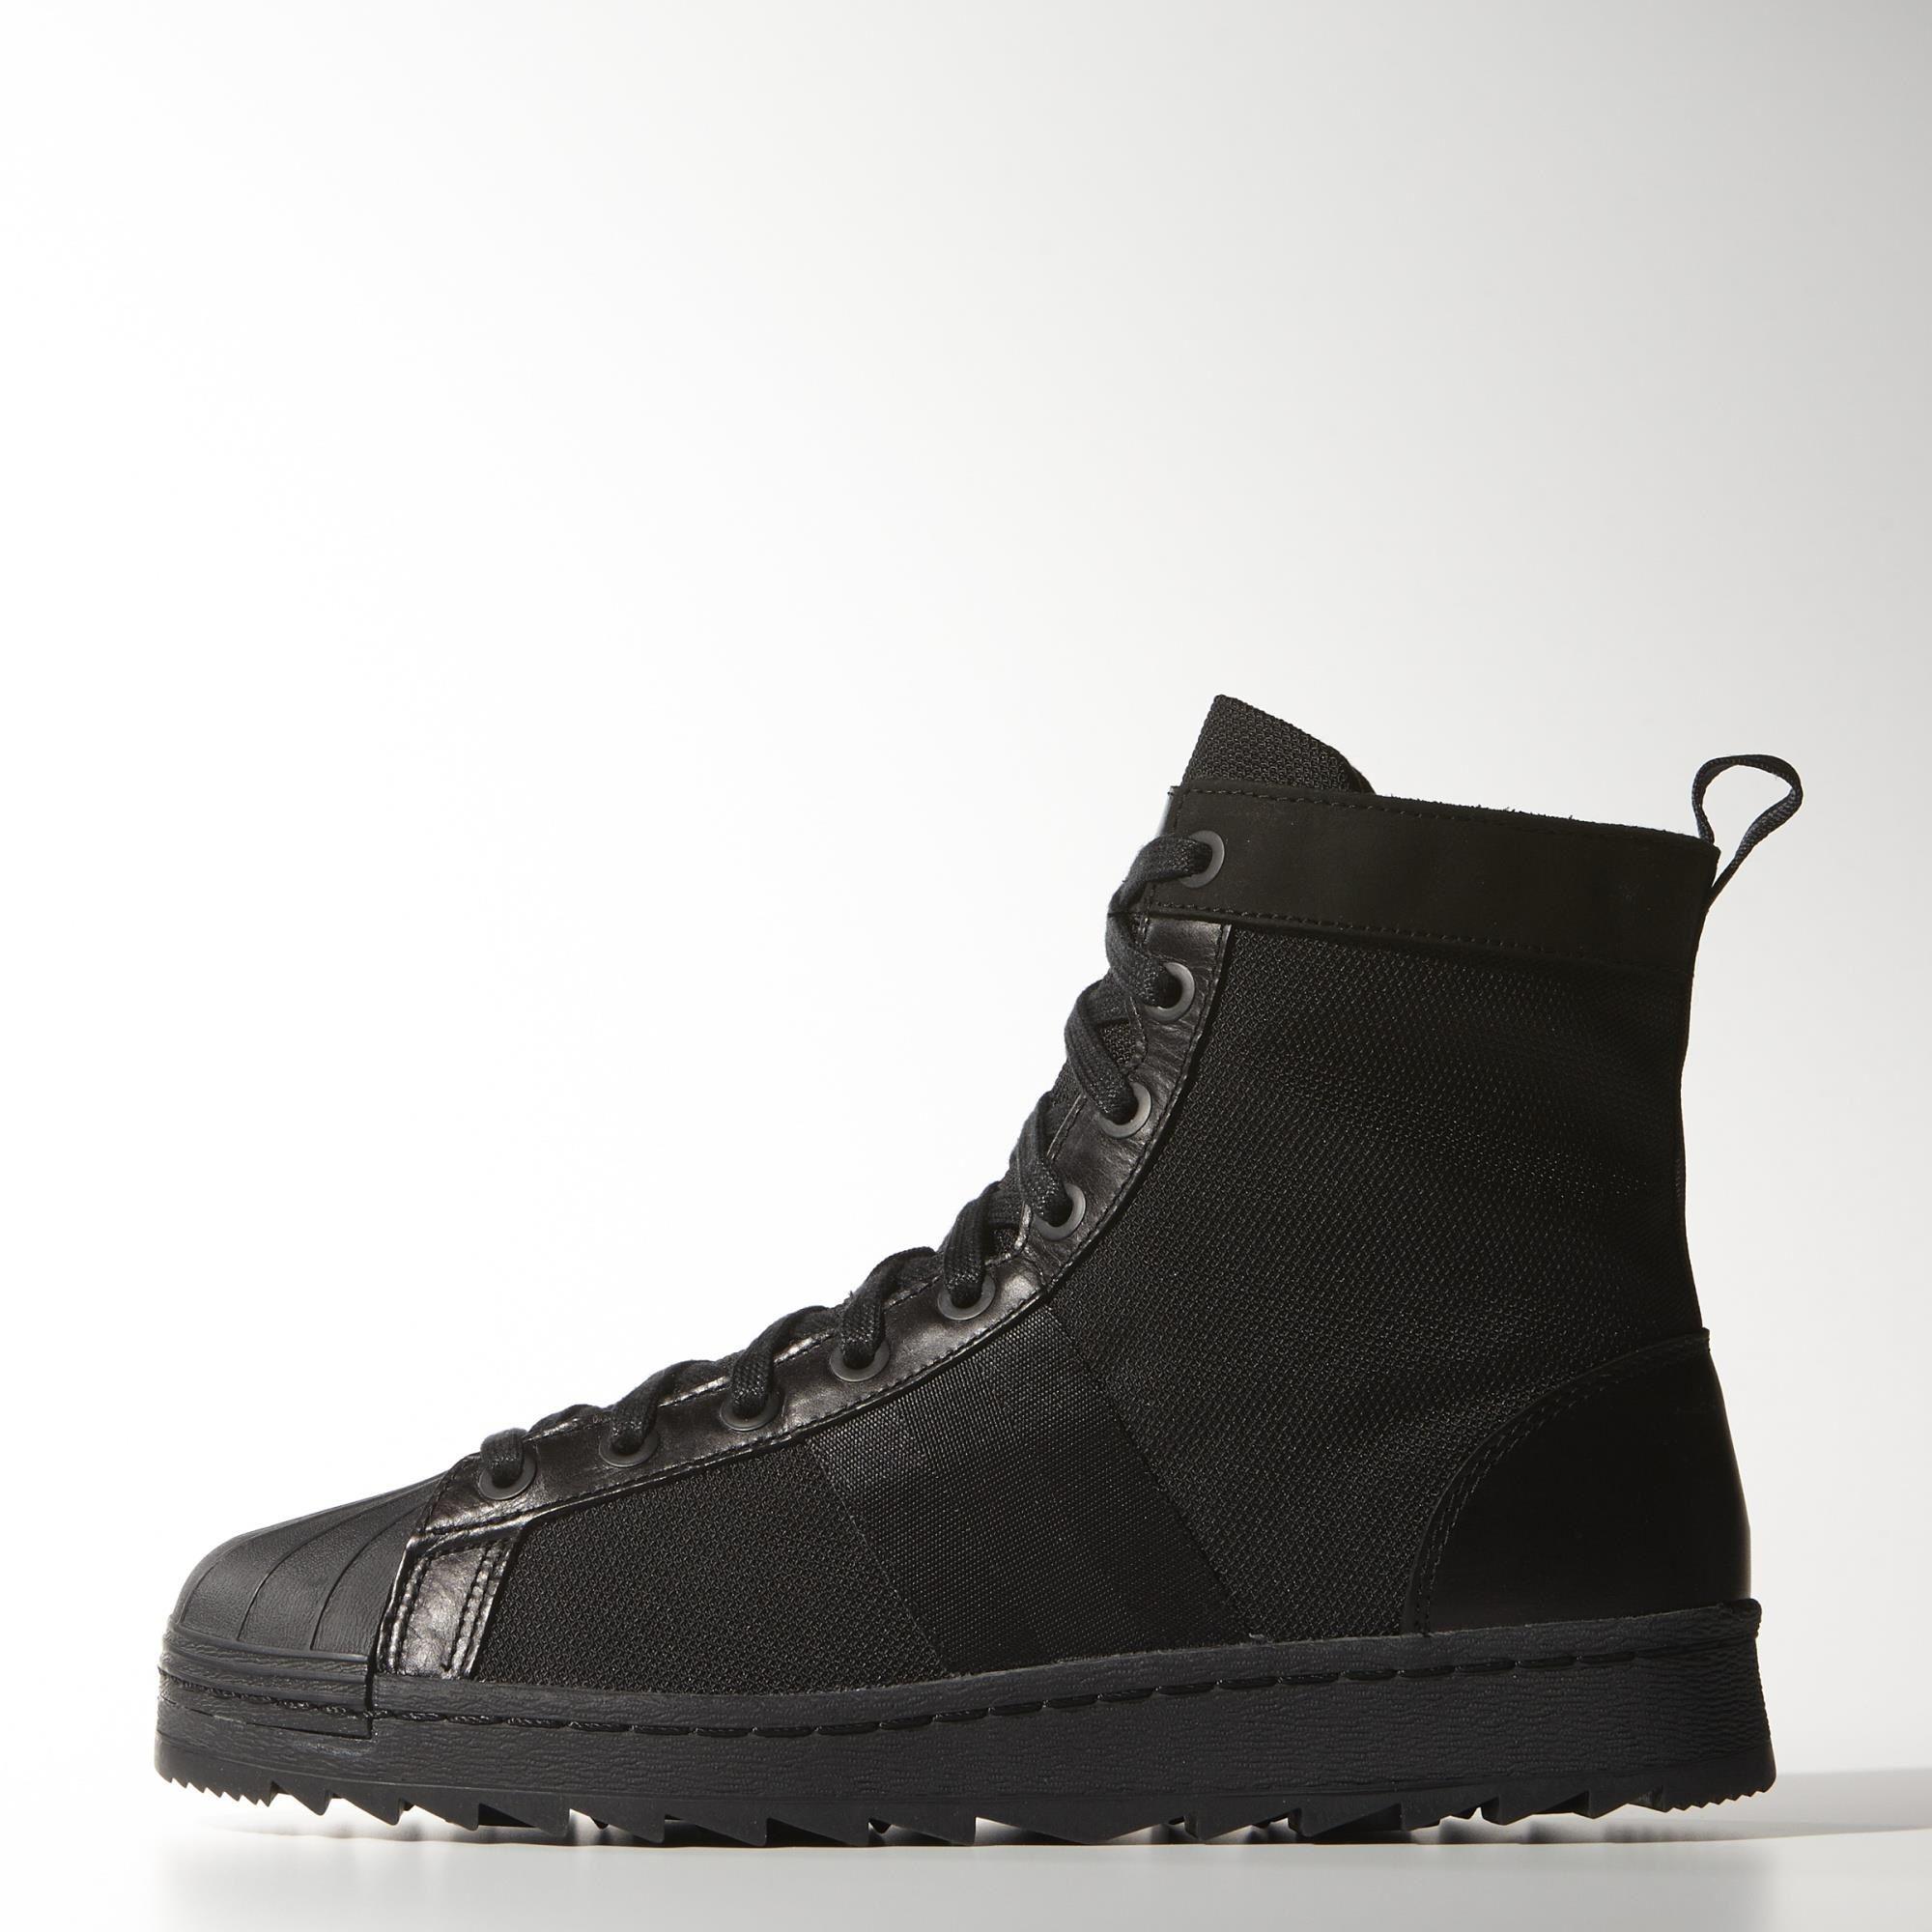 adidas Superstar Jungle Boots | adidas